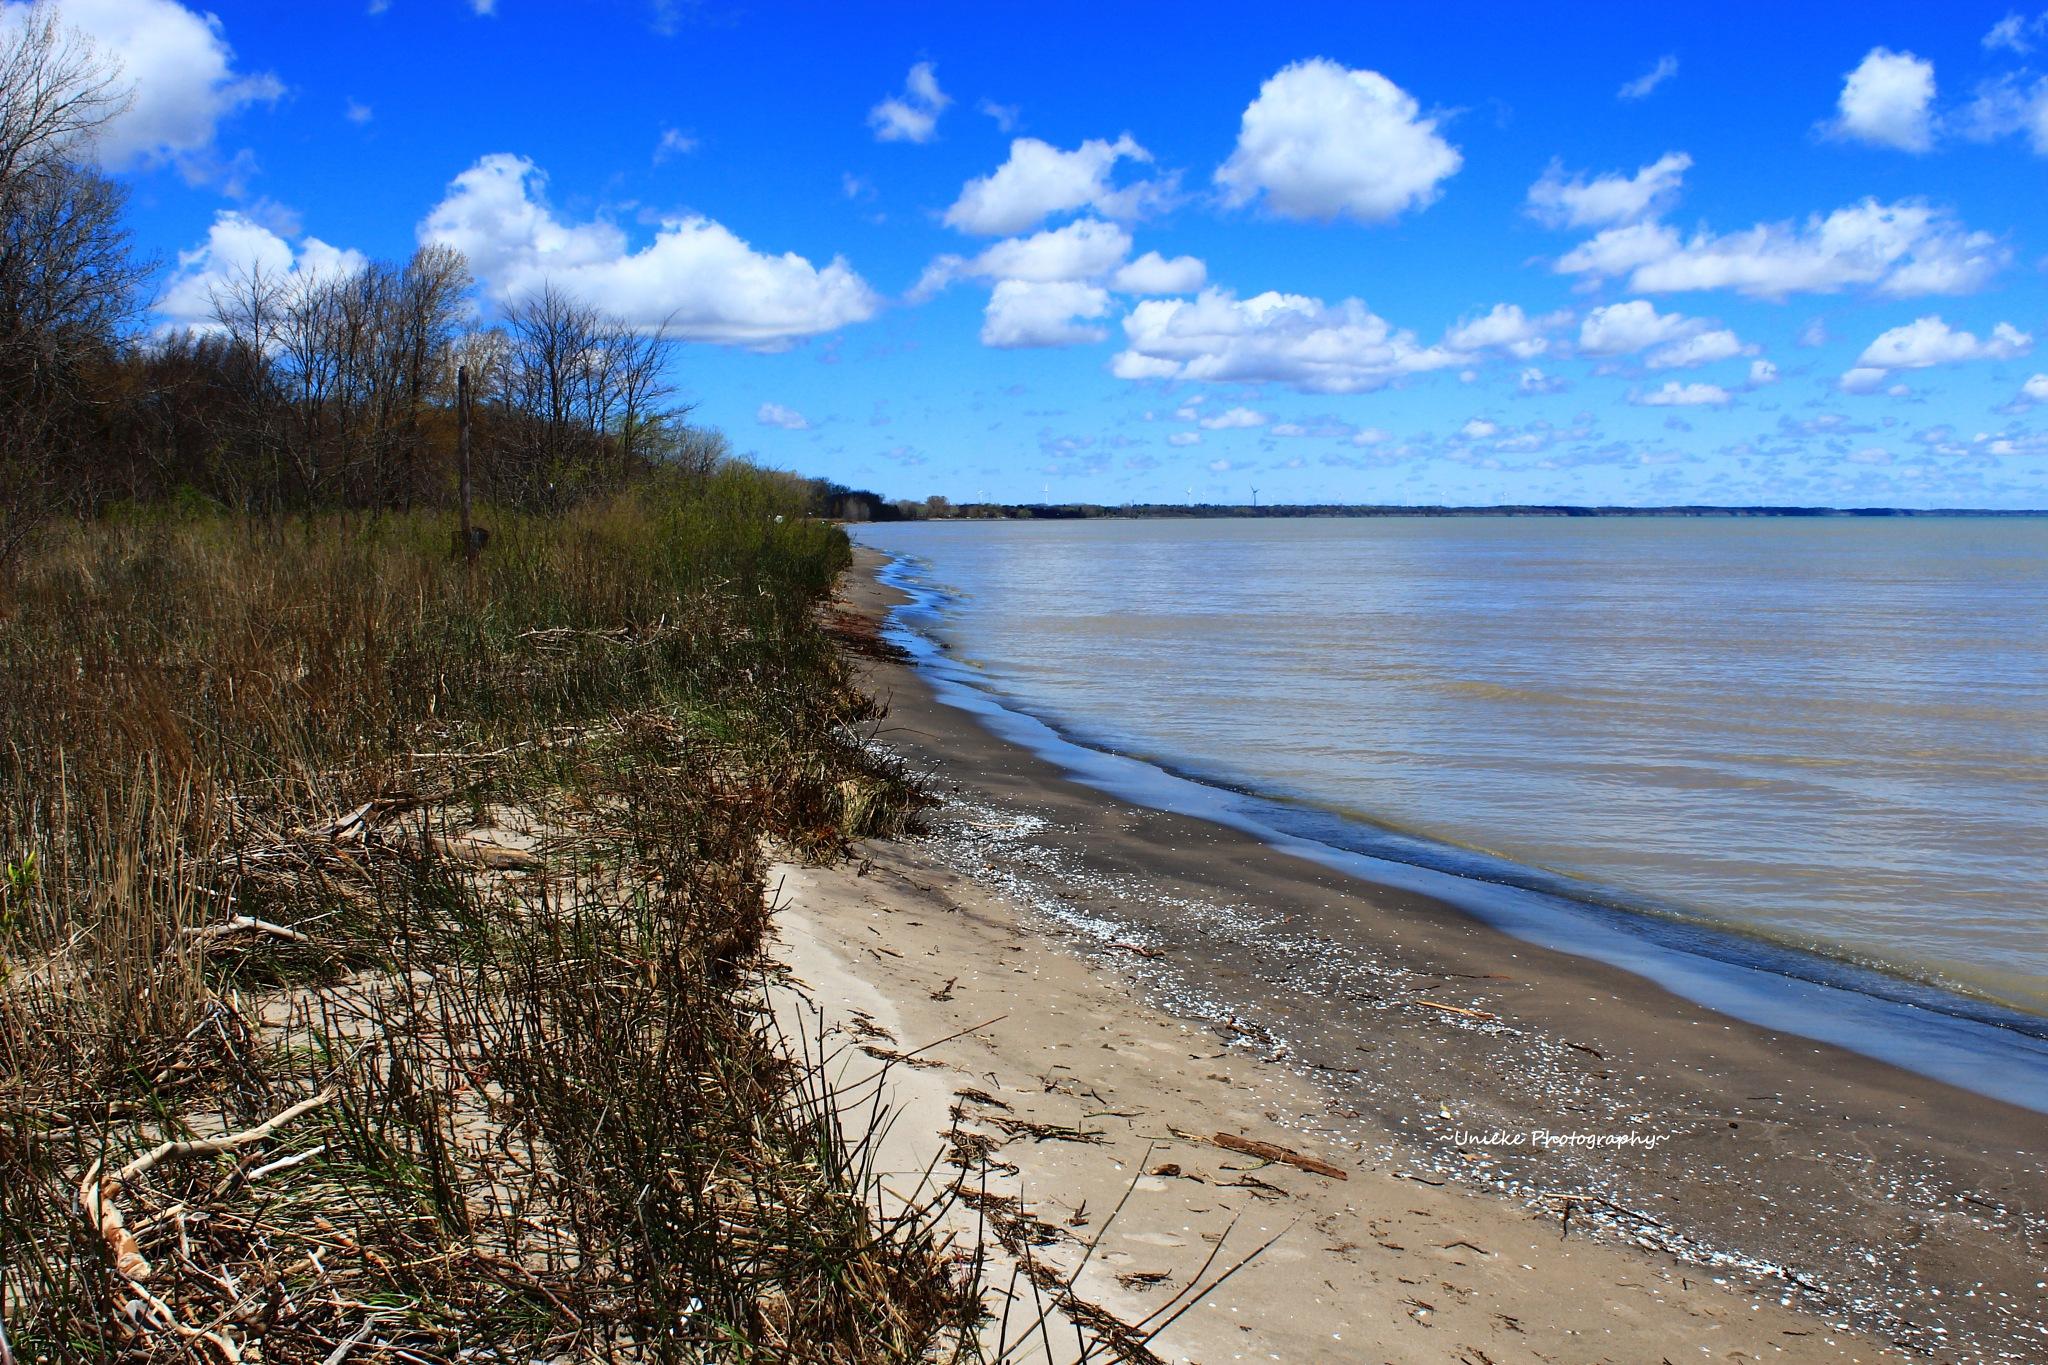 Erie Beach by ~Unieke Photography~